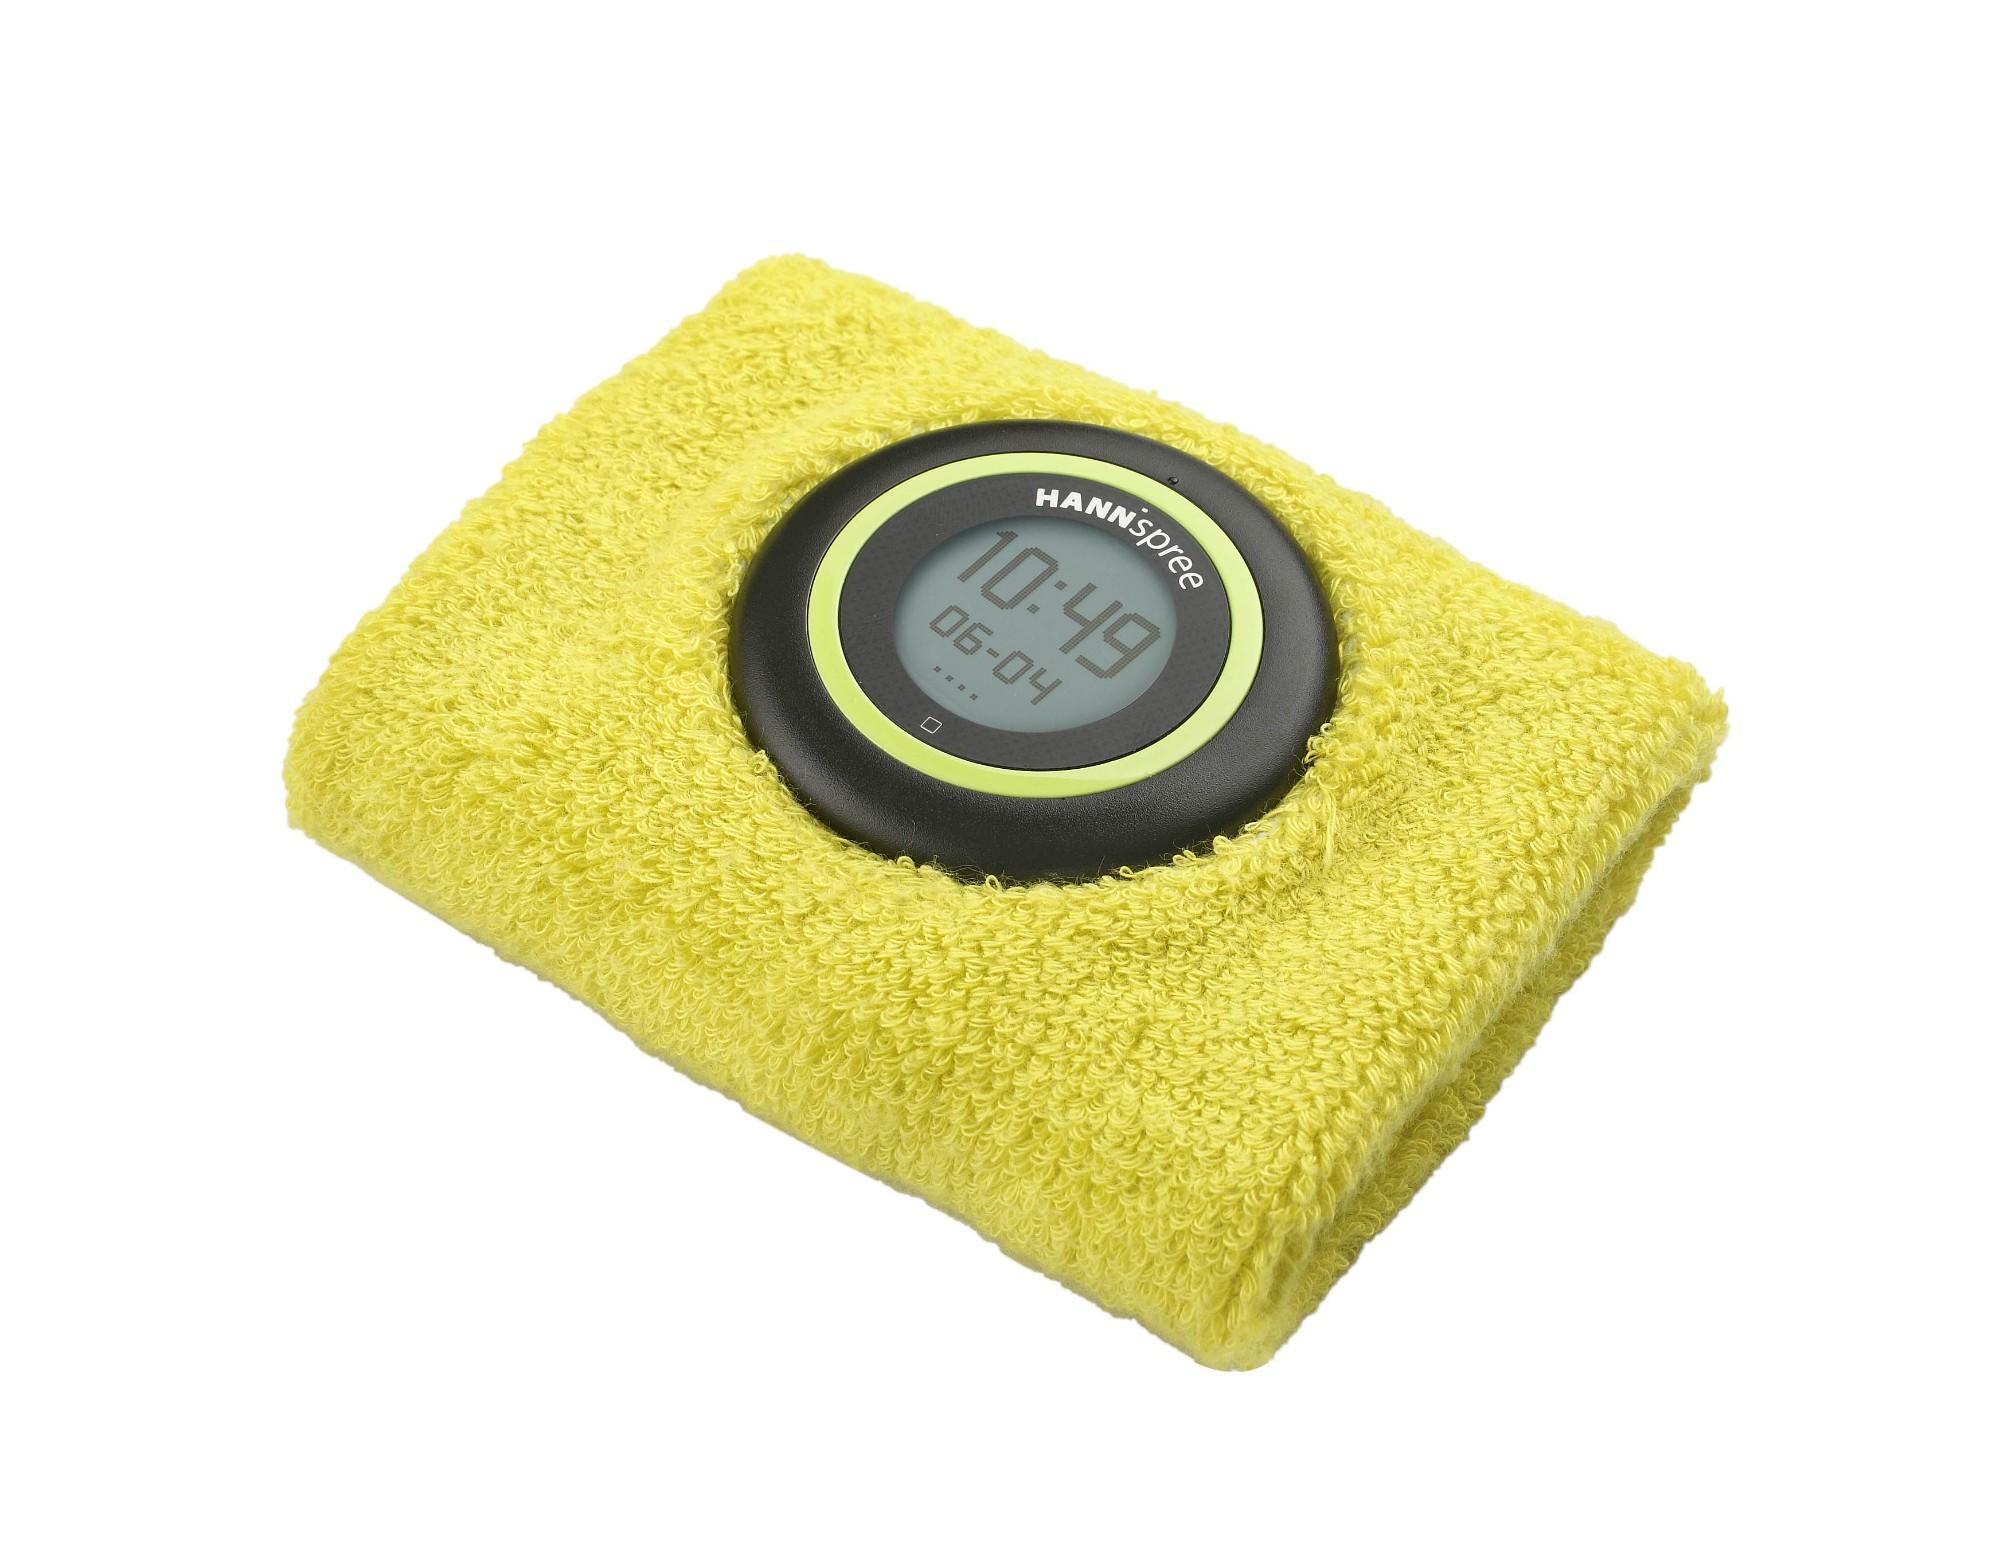 "Hannspree SW49ST11 Wristband activity tracker 0.9"" Black,Green,Orange activity tracker"